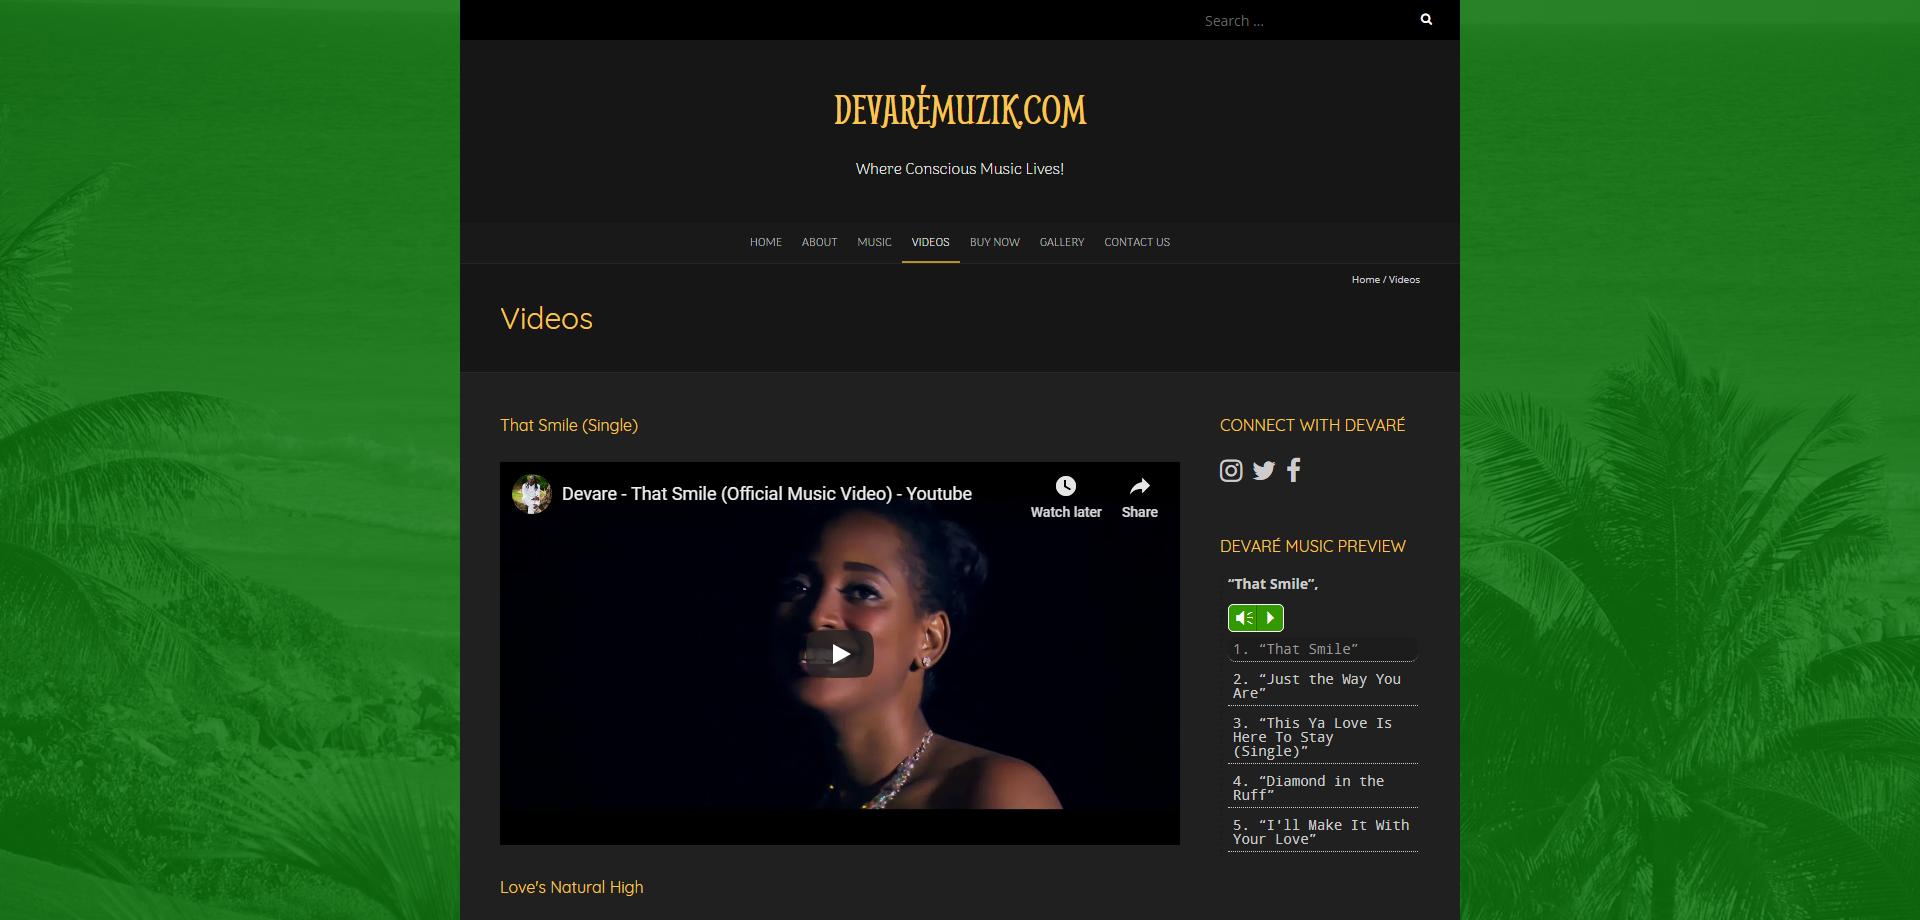 DevareMuzik Videos Web page 1